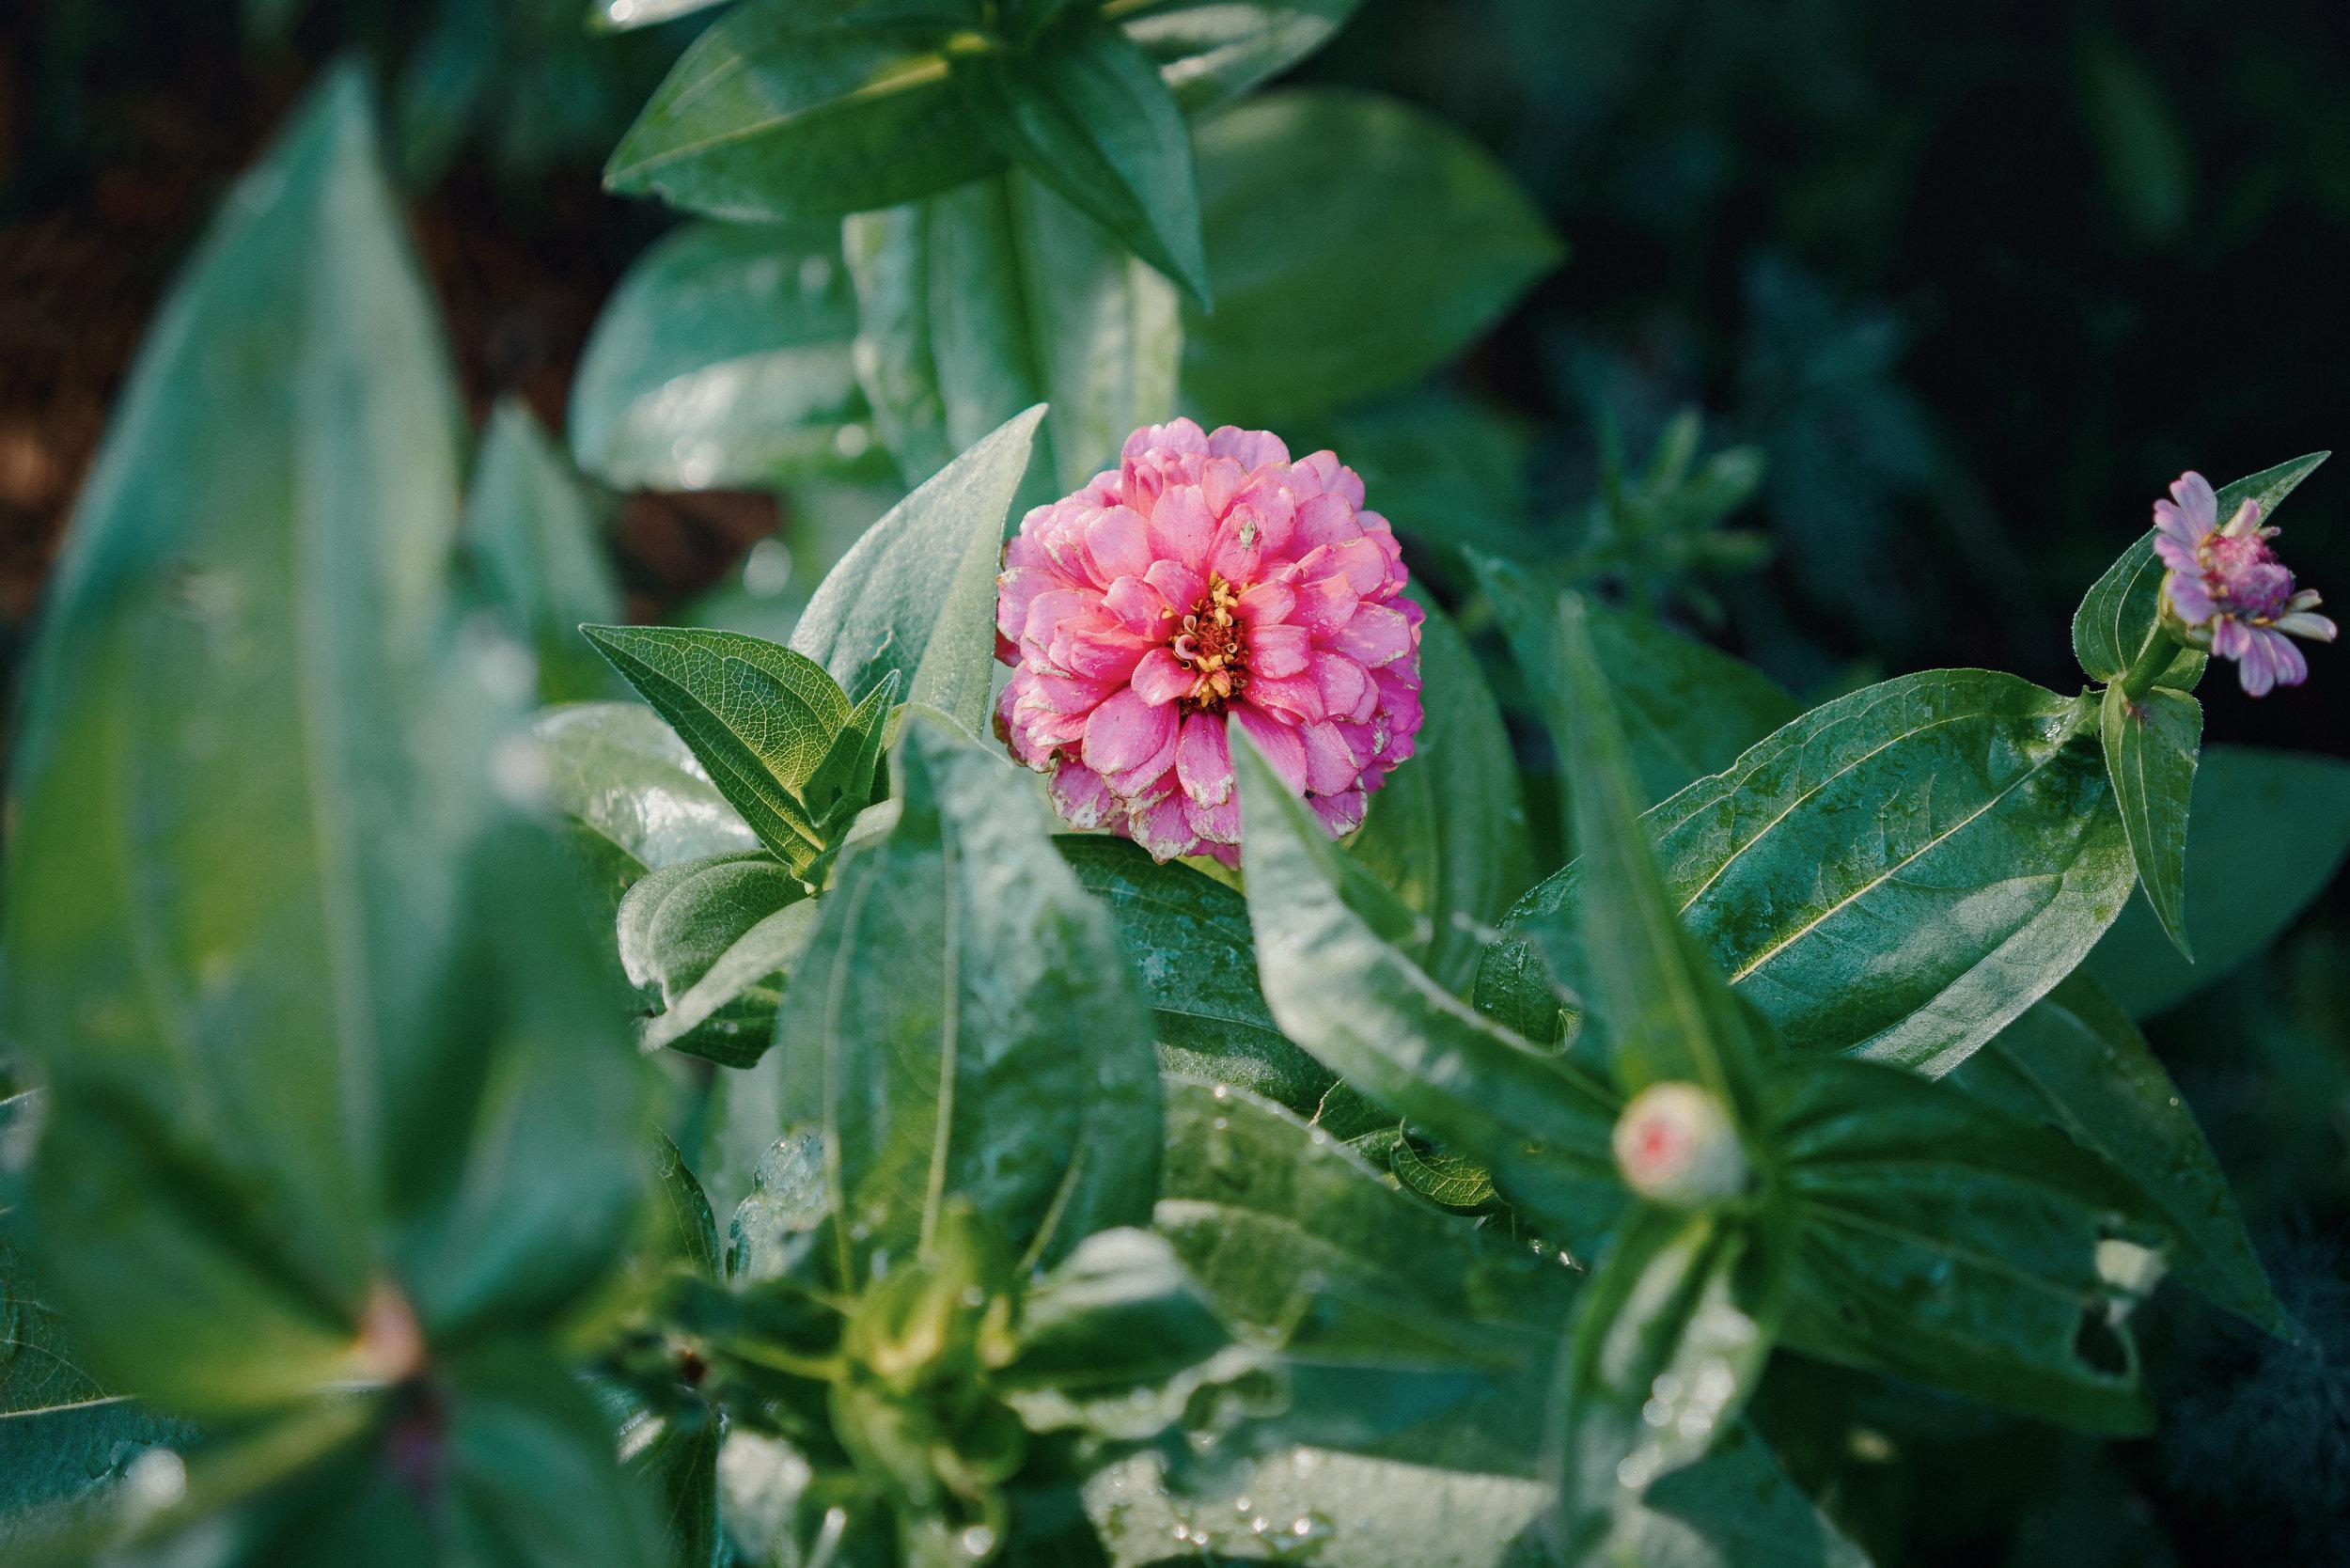 june2019-garden-2.jpg